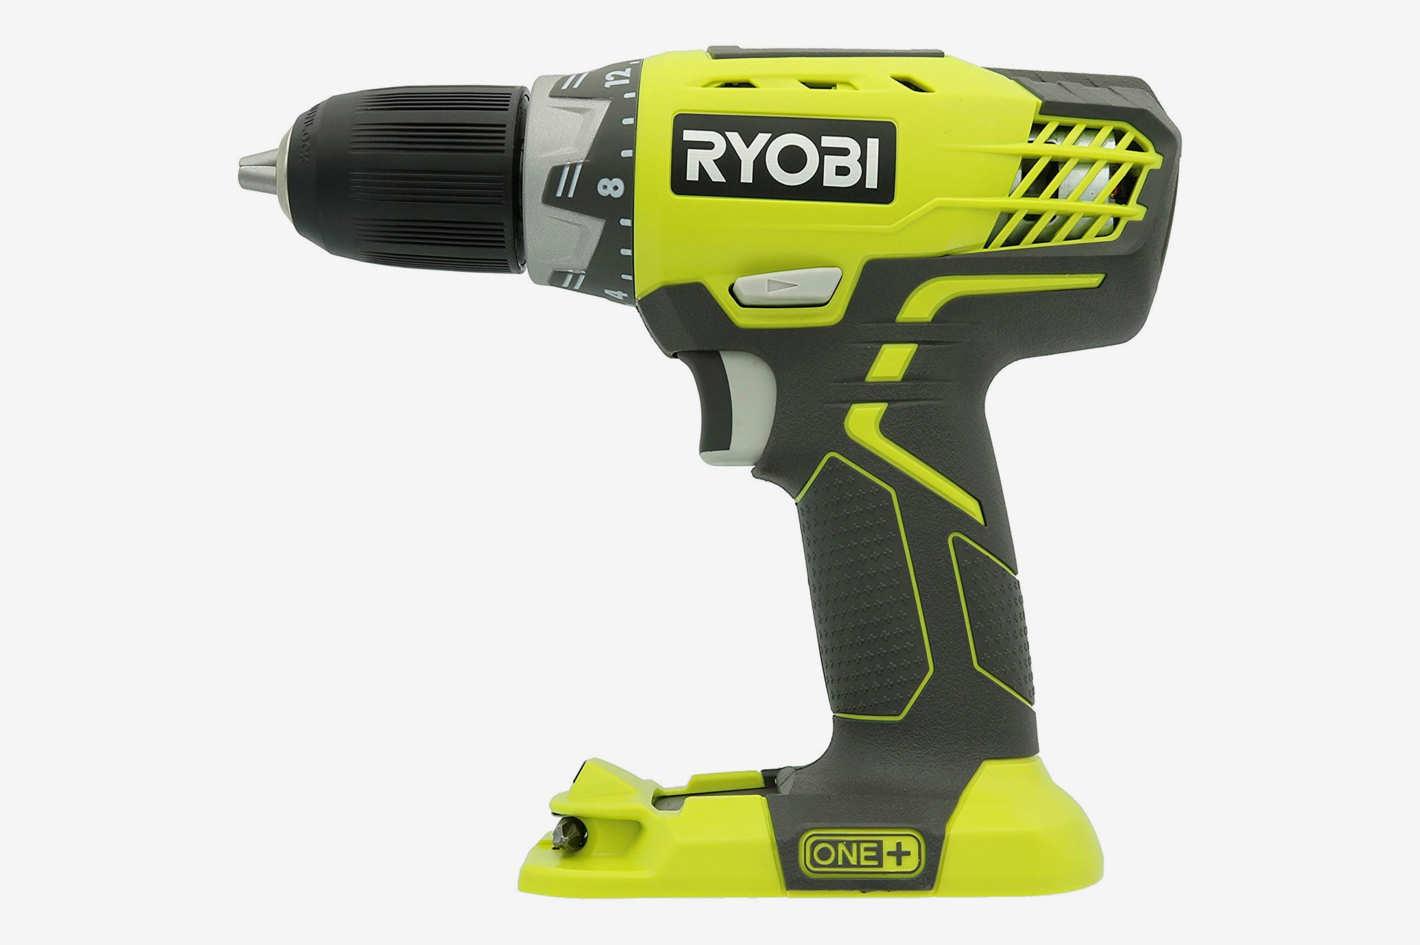 Ryobi P208 One+ 18V Lithium Ion Drill/Driver